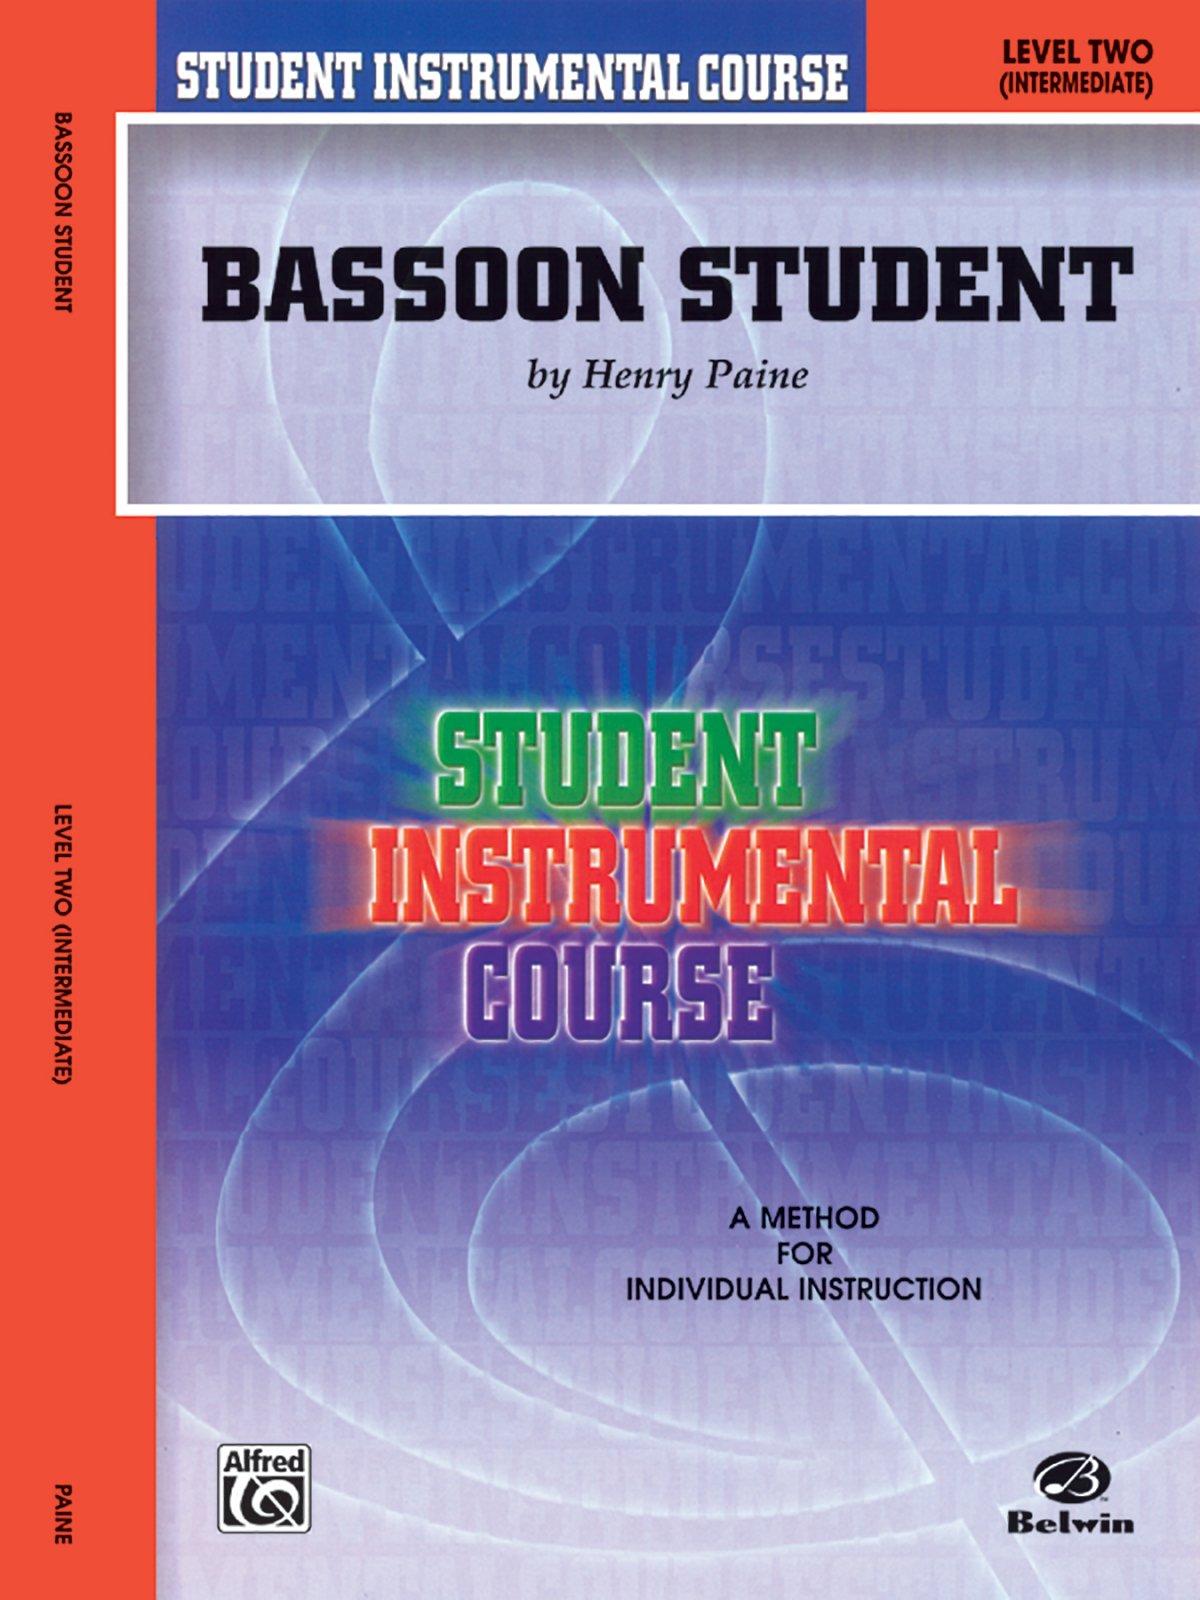 Student Instrumental Course Bassoon Student: Level II ebook